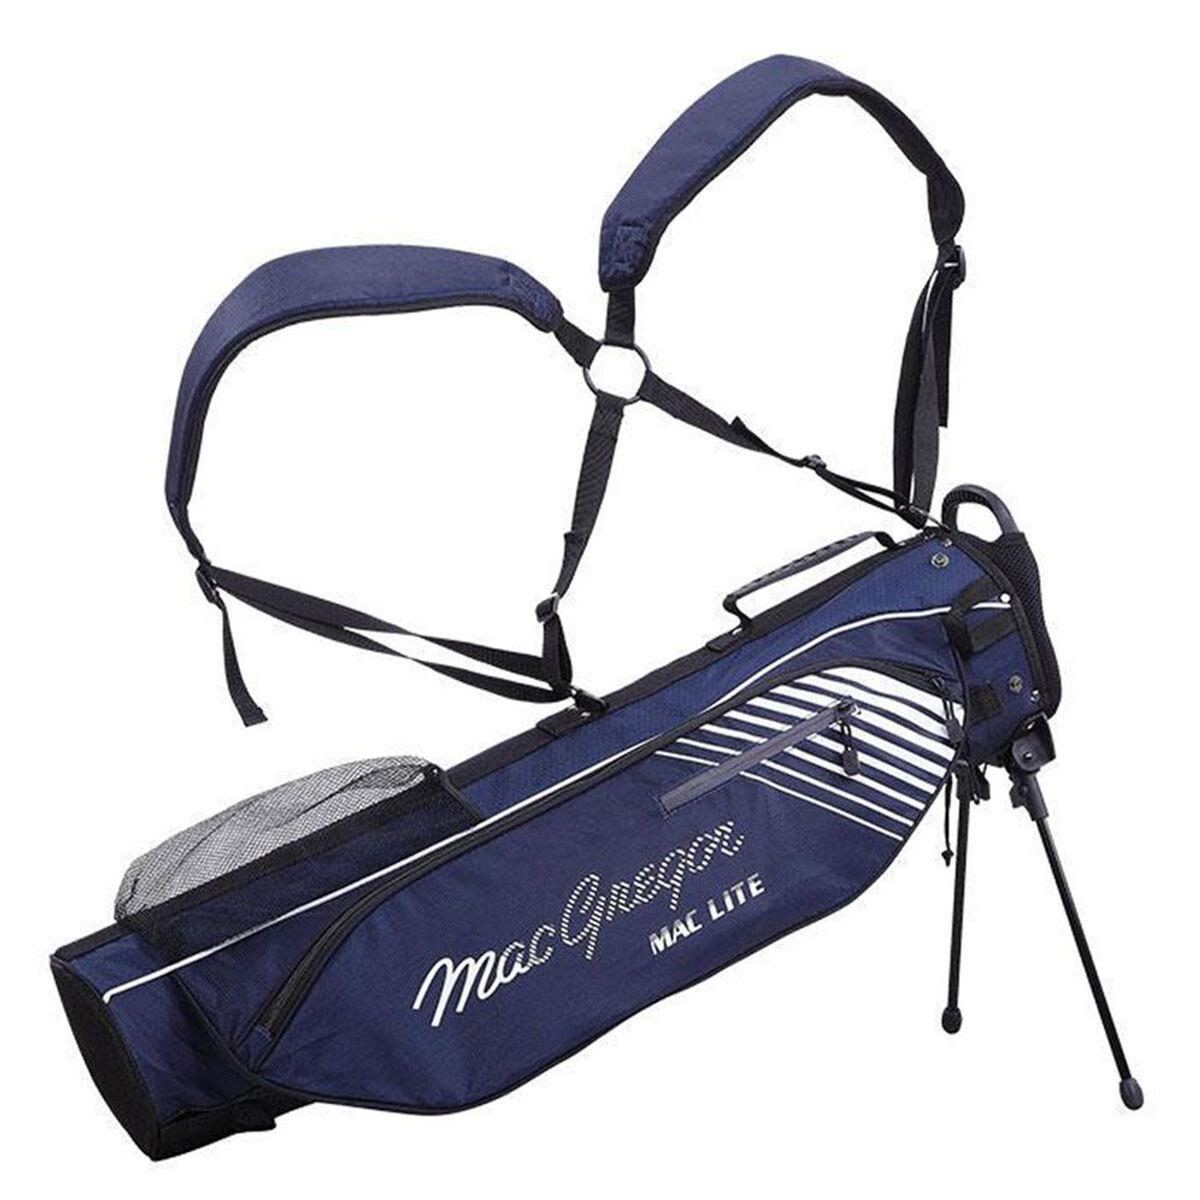 MacGregor MAC 4.0 Flip Golf Stand Bag, Navy   American Golf